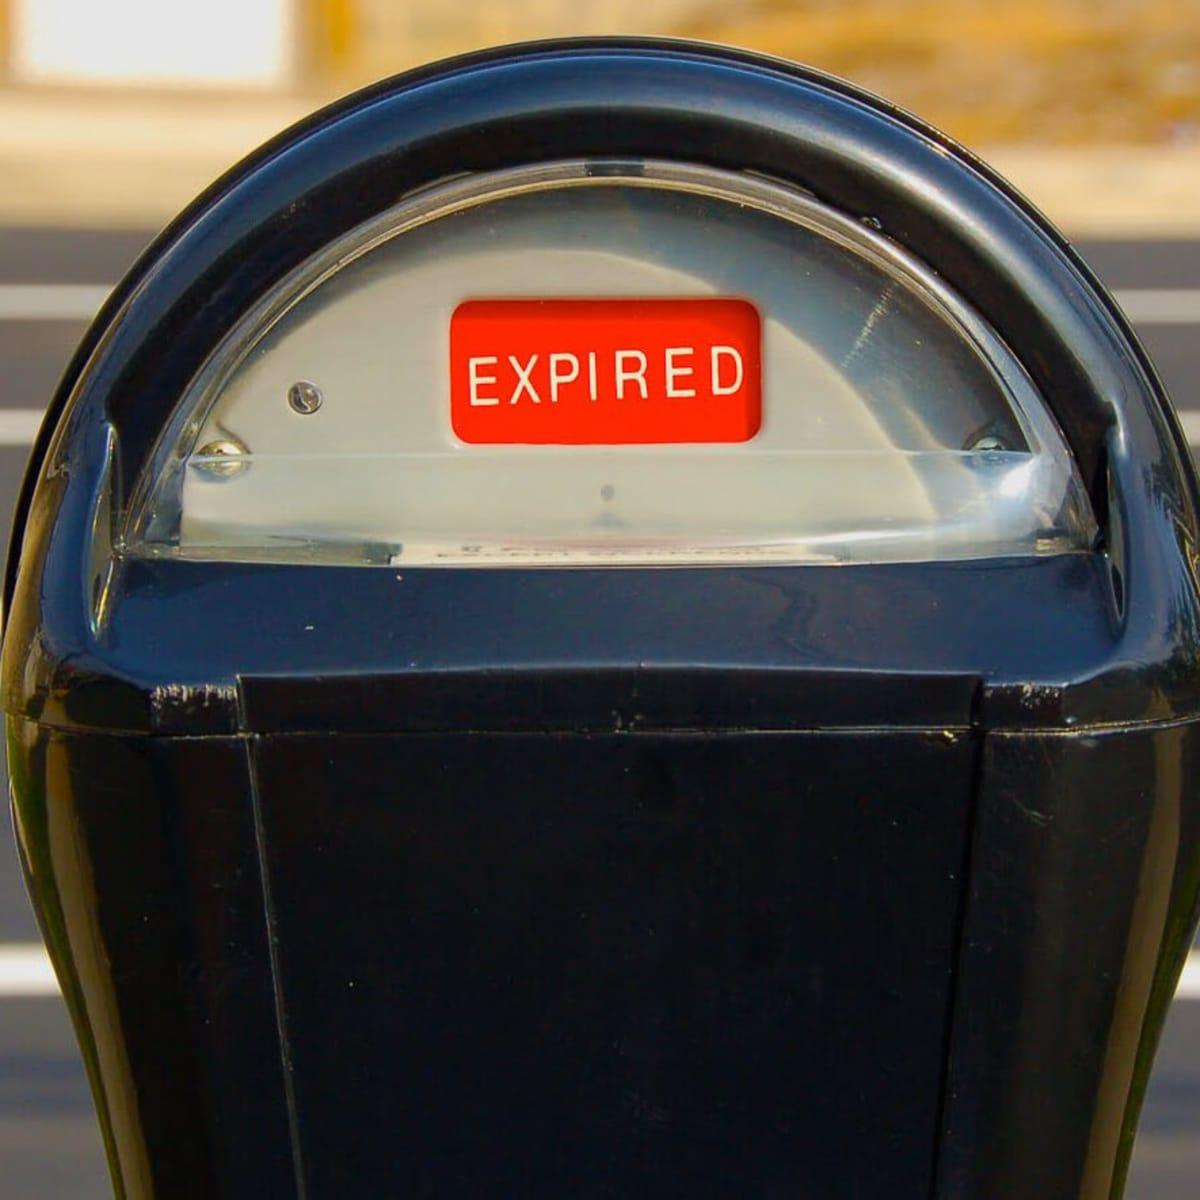 News_parking meter_expired